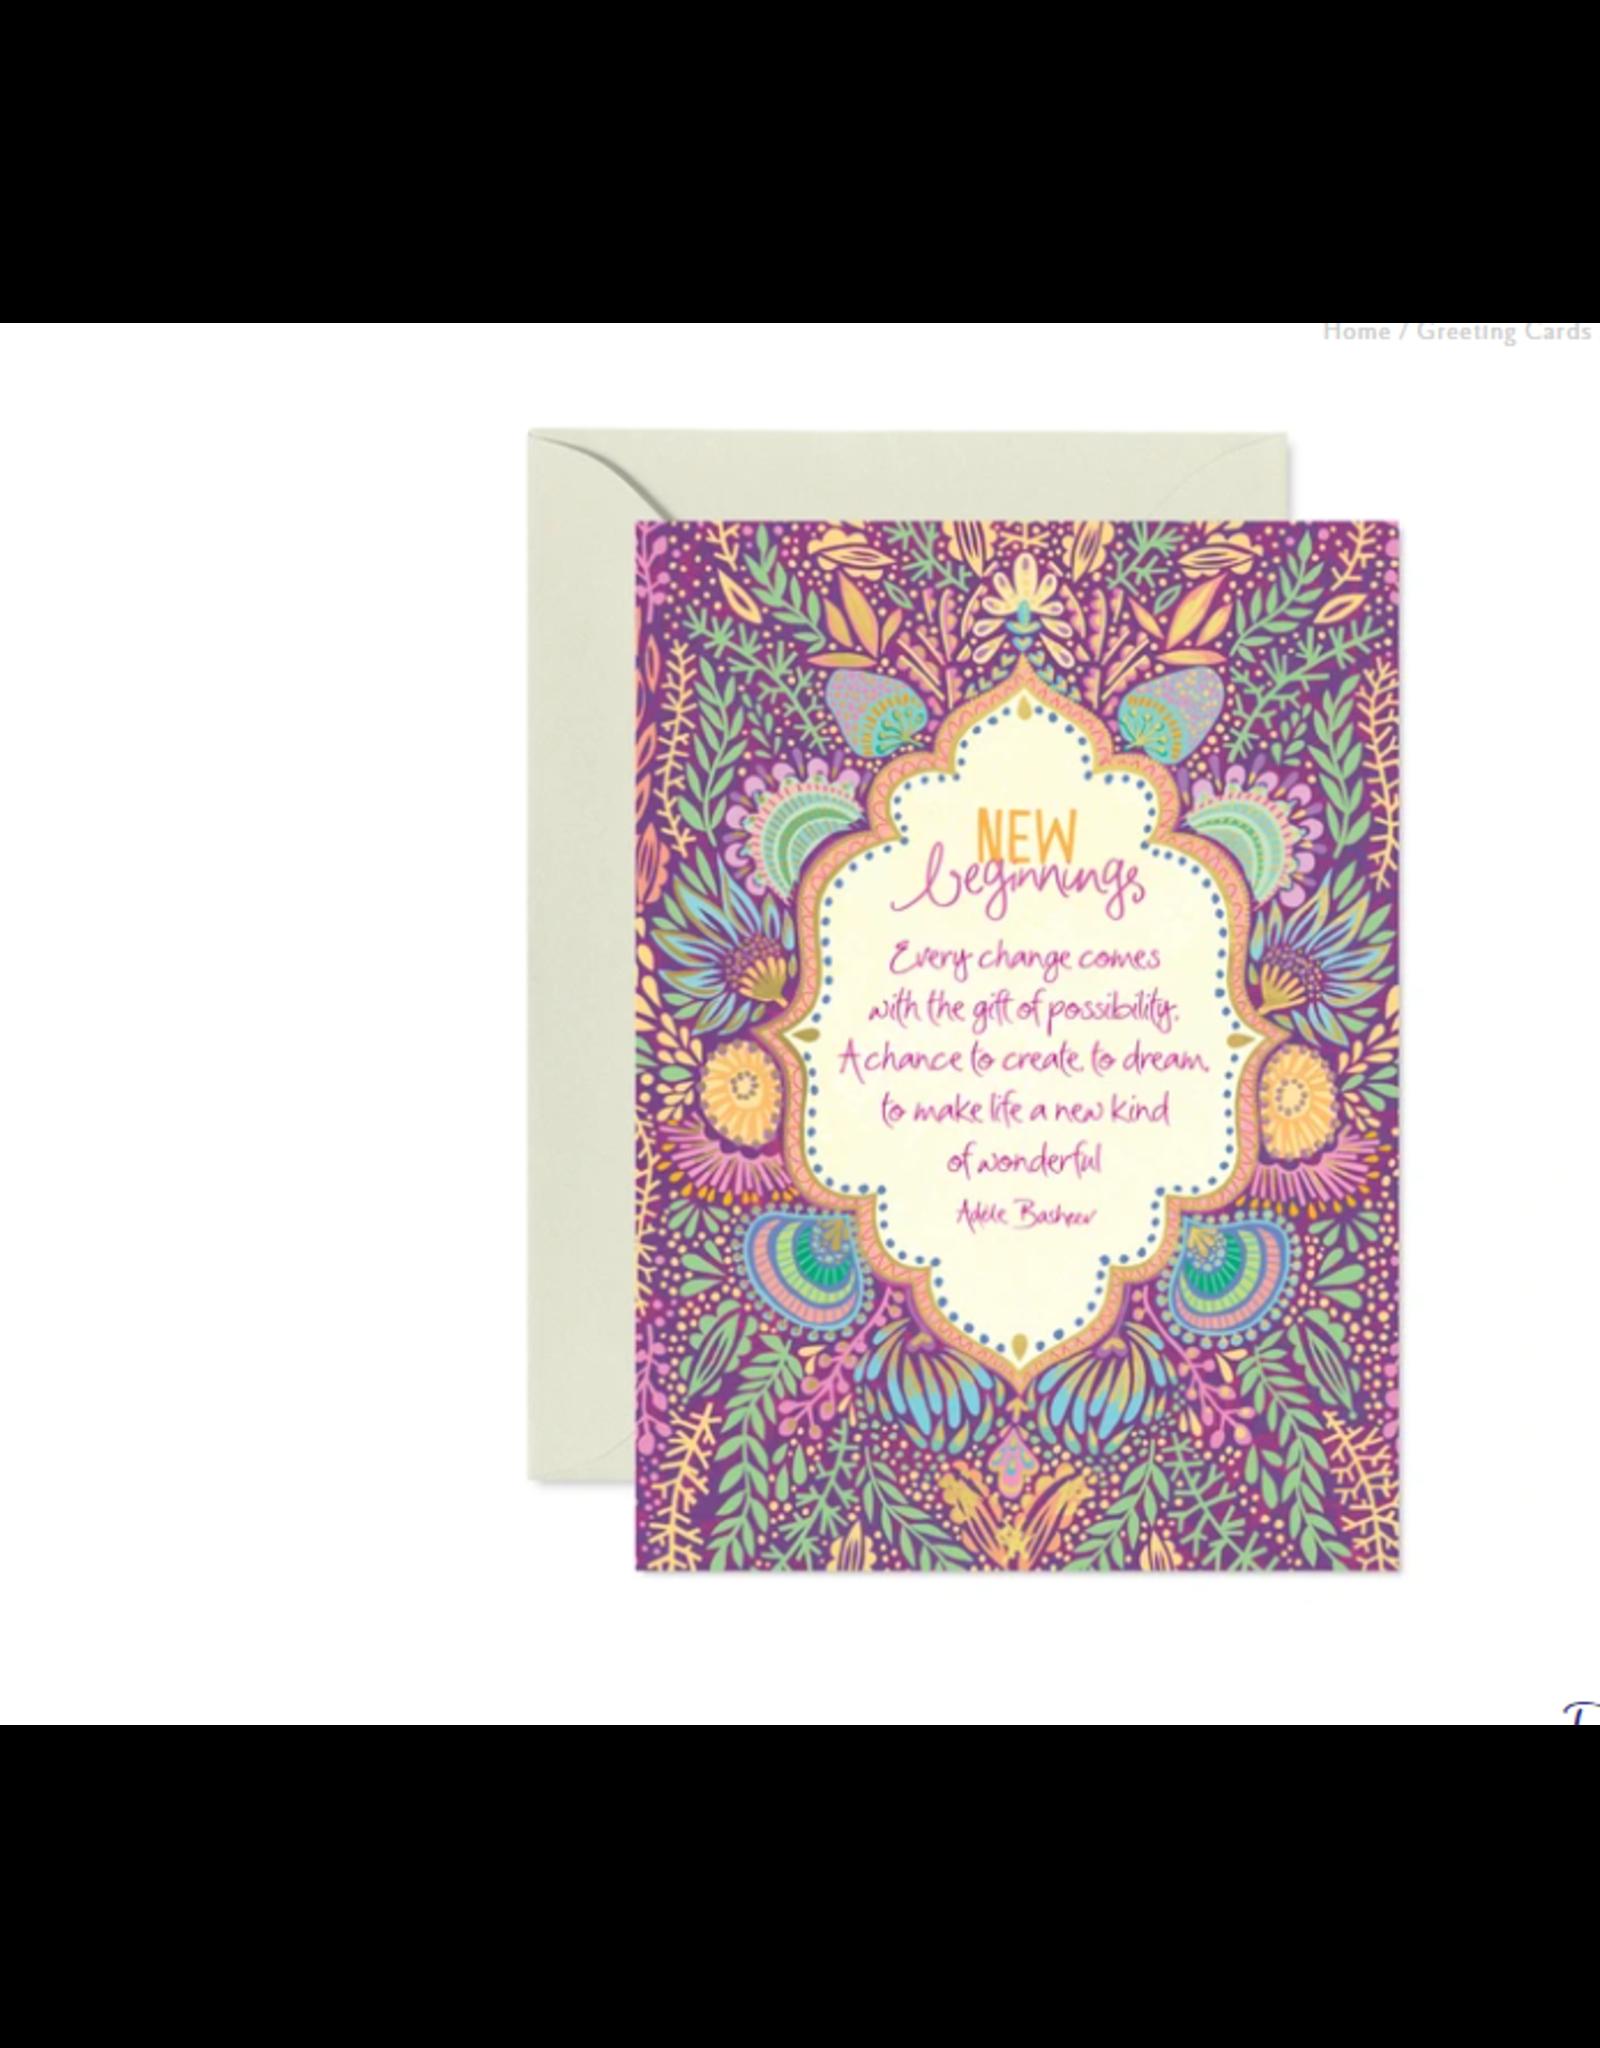 Intrinsic New Beginnings Greeting Card